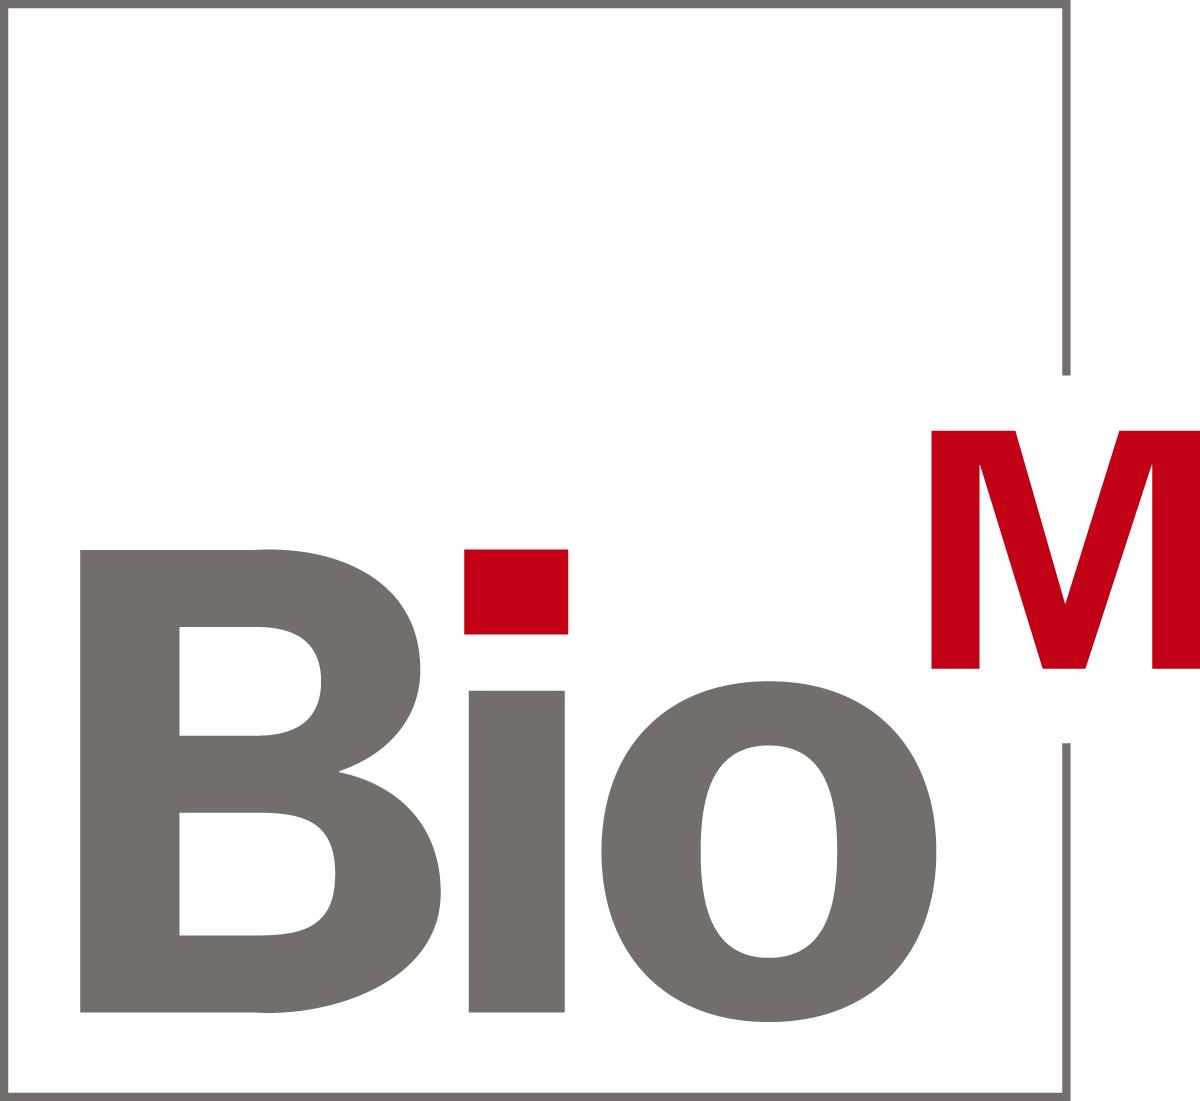 BioM Cluster Development GmbH